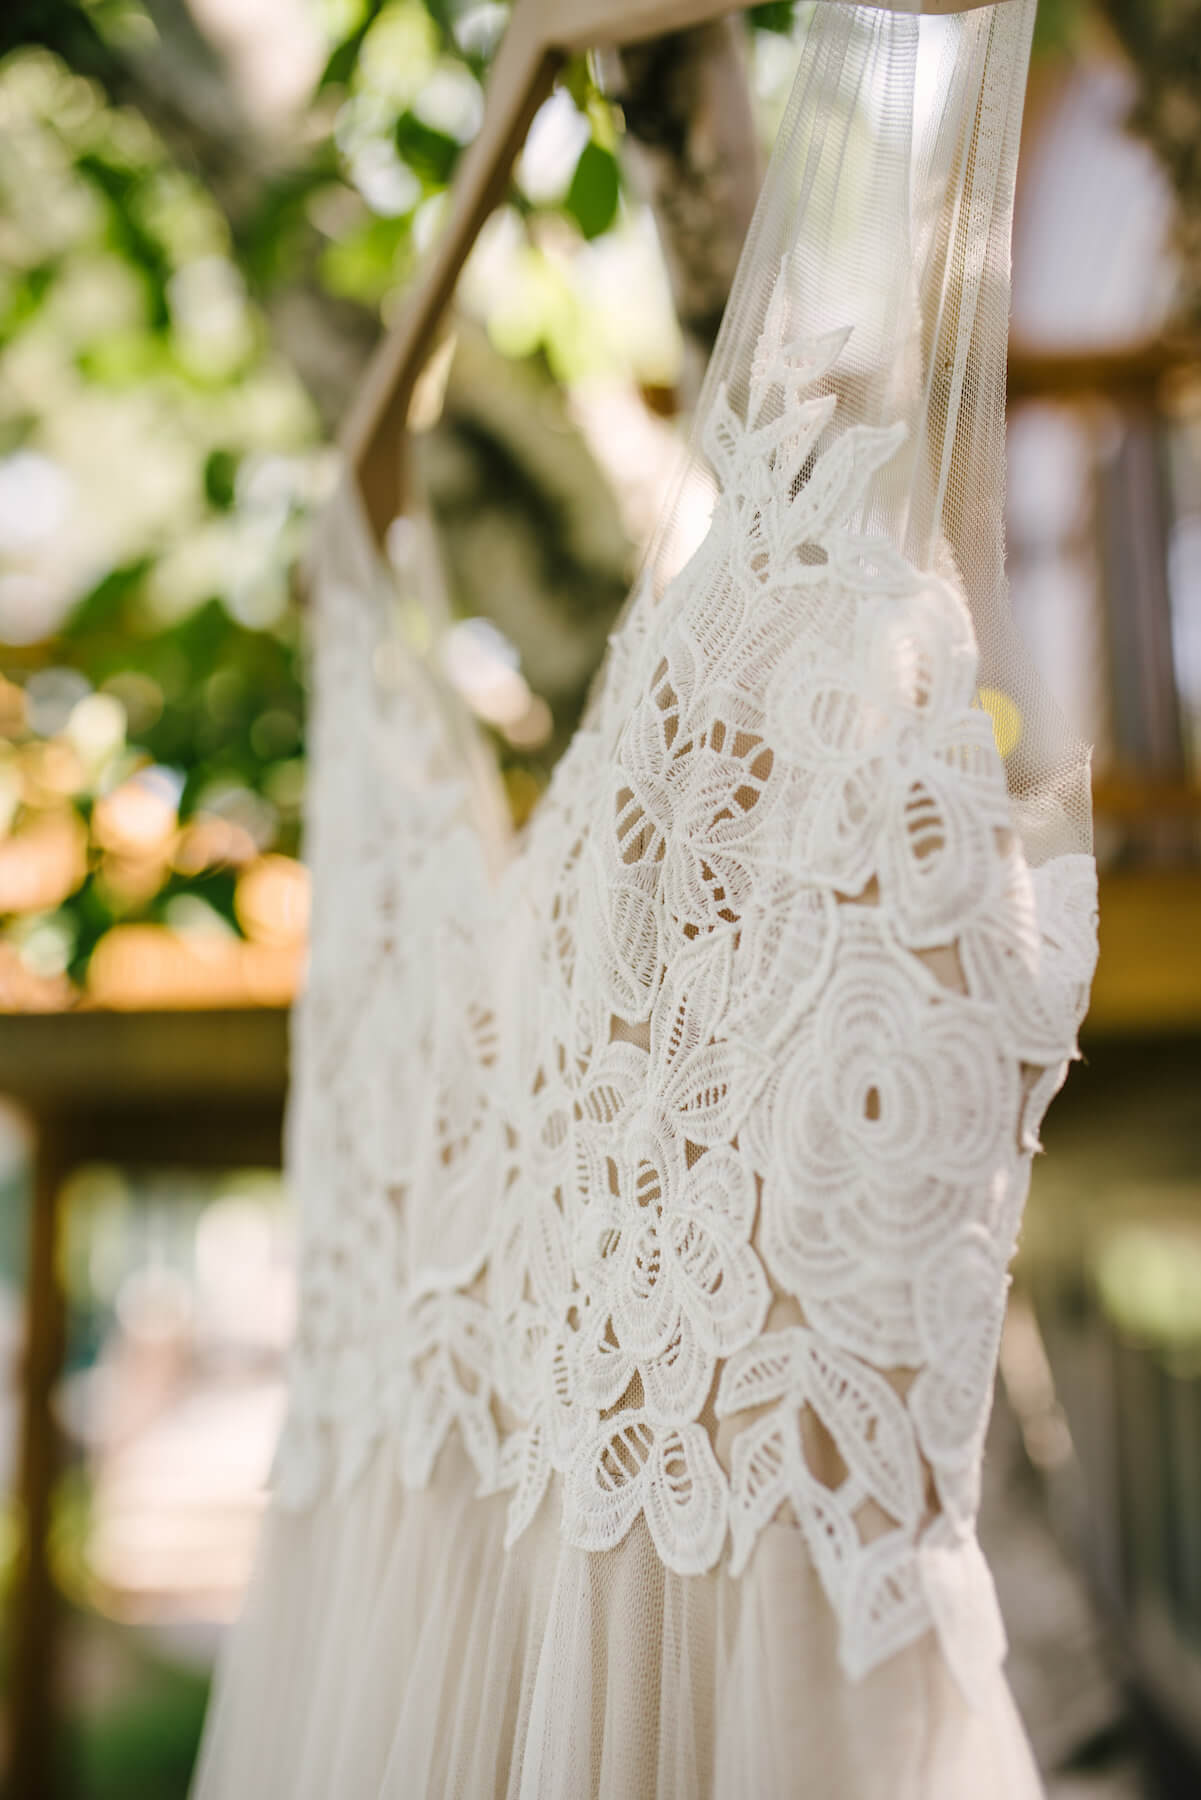 engle-olson-wedding-blair-taylor-6.jpg